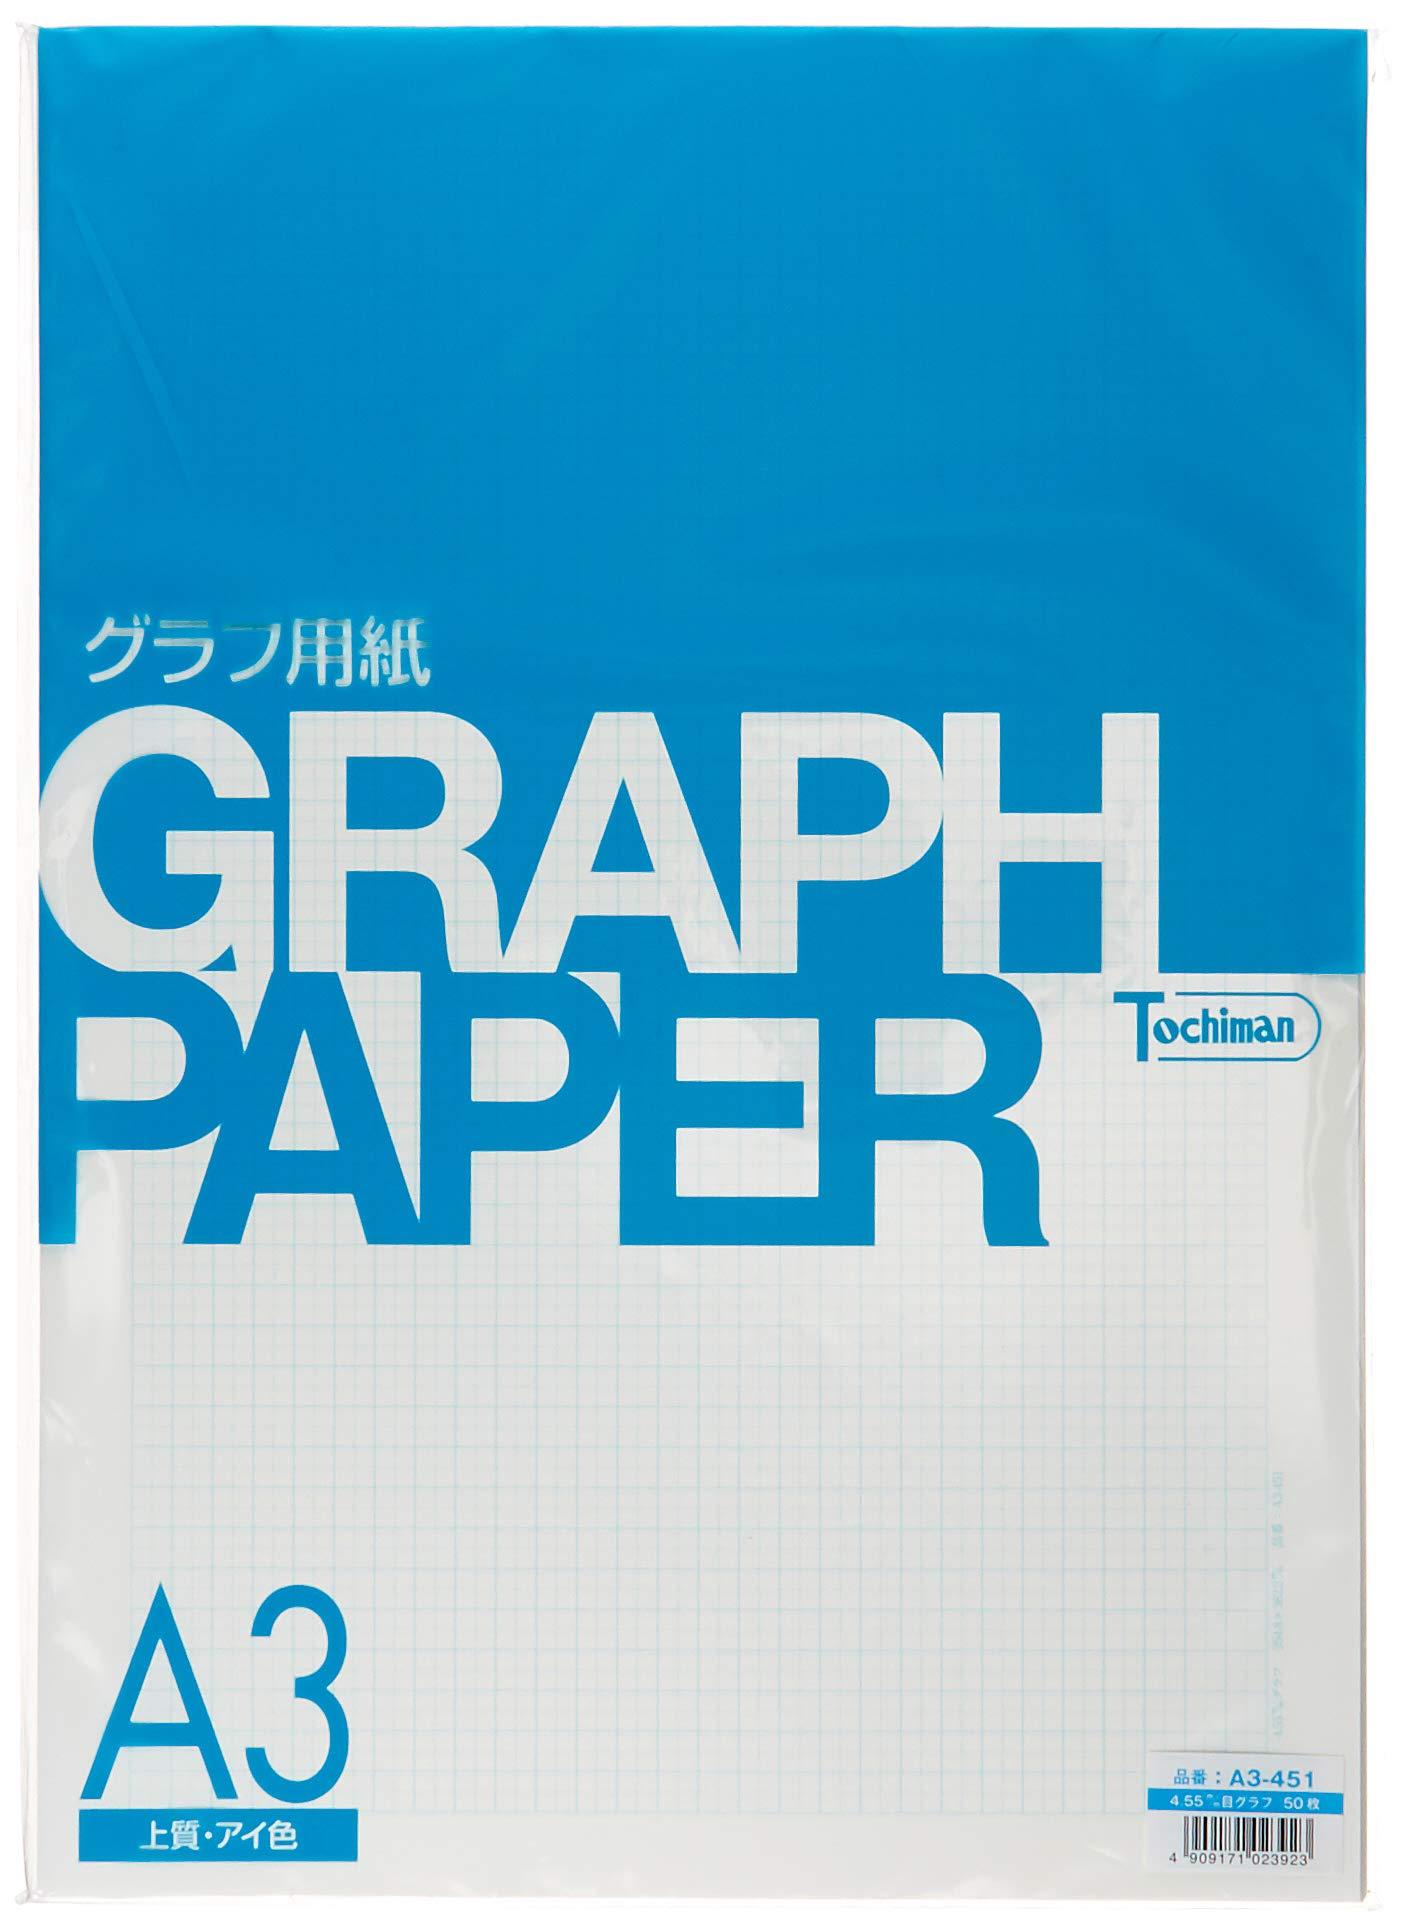 Sakaeshigyo Tochiman architectural graph paper 4.55 mm grid A3 50 sheets eye color paper 81.4 g A3-451